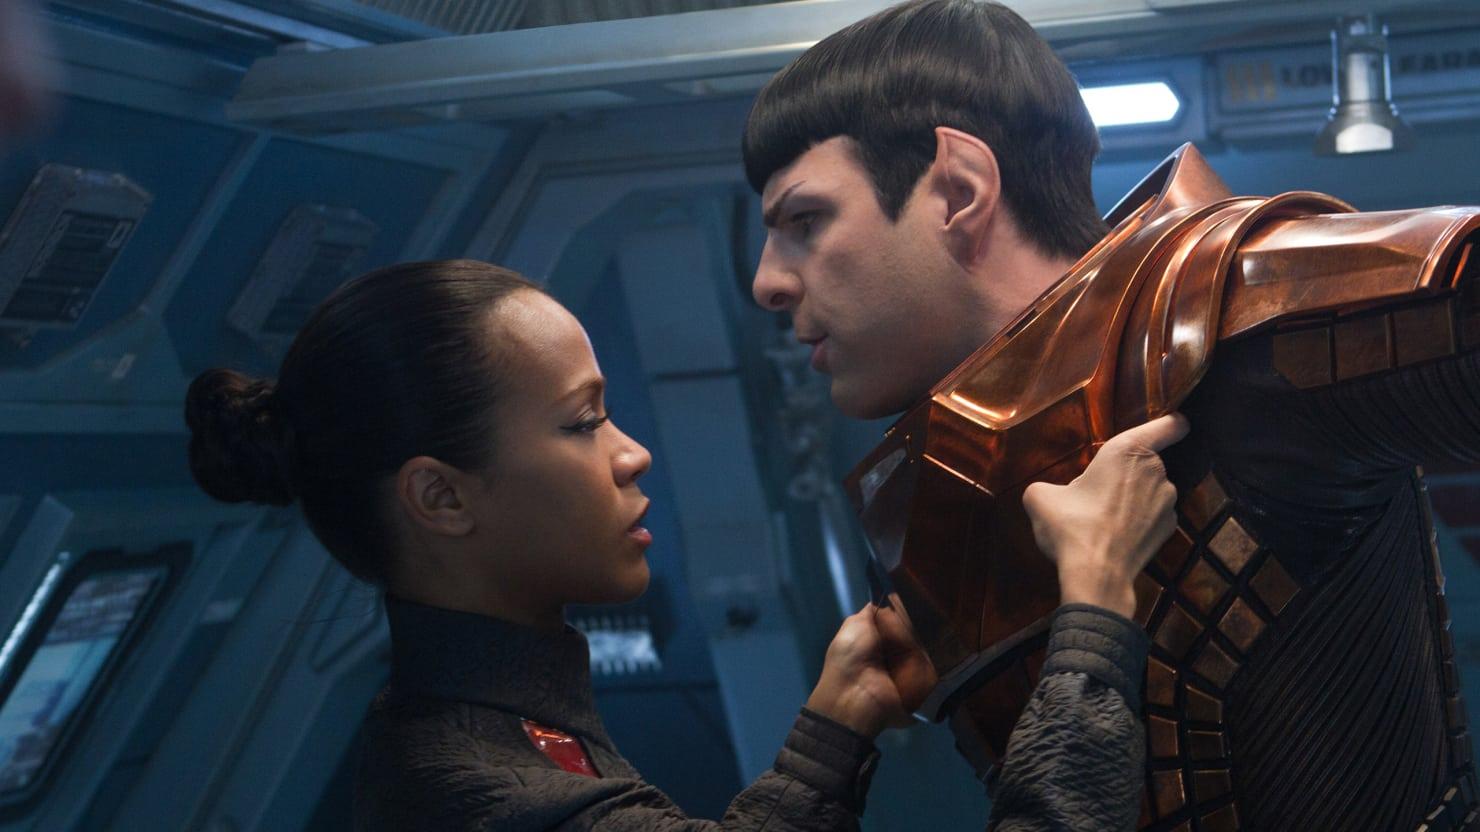 Uhura (Zoe Saldana) and Spock (Zachary Quinto) in Star Trek Into Darkness (2013)